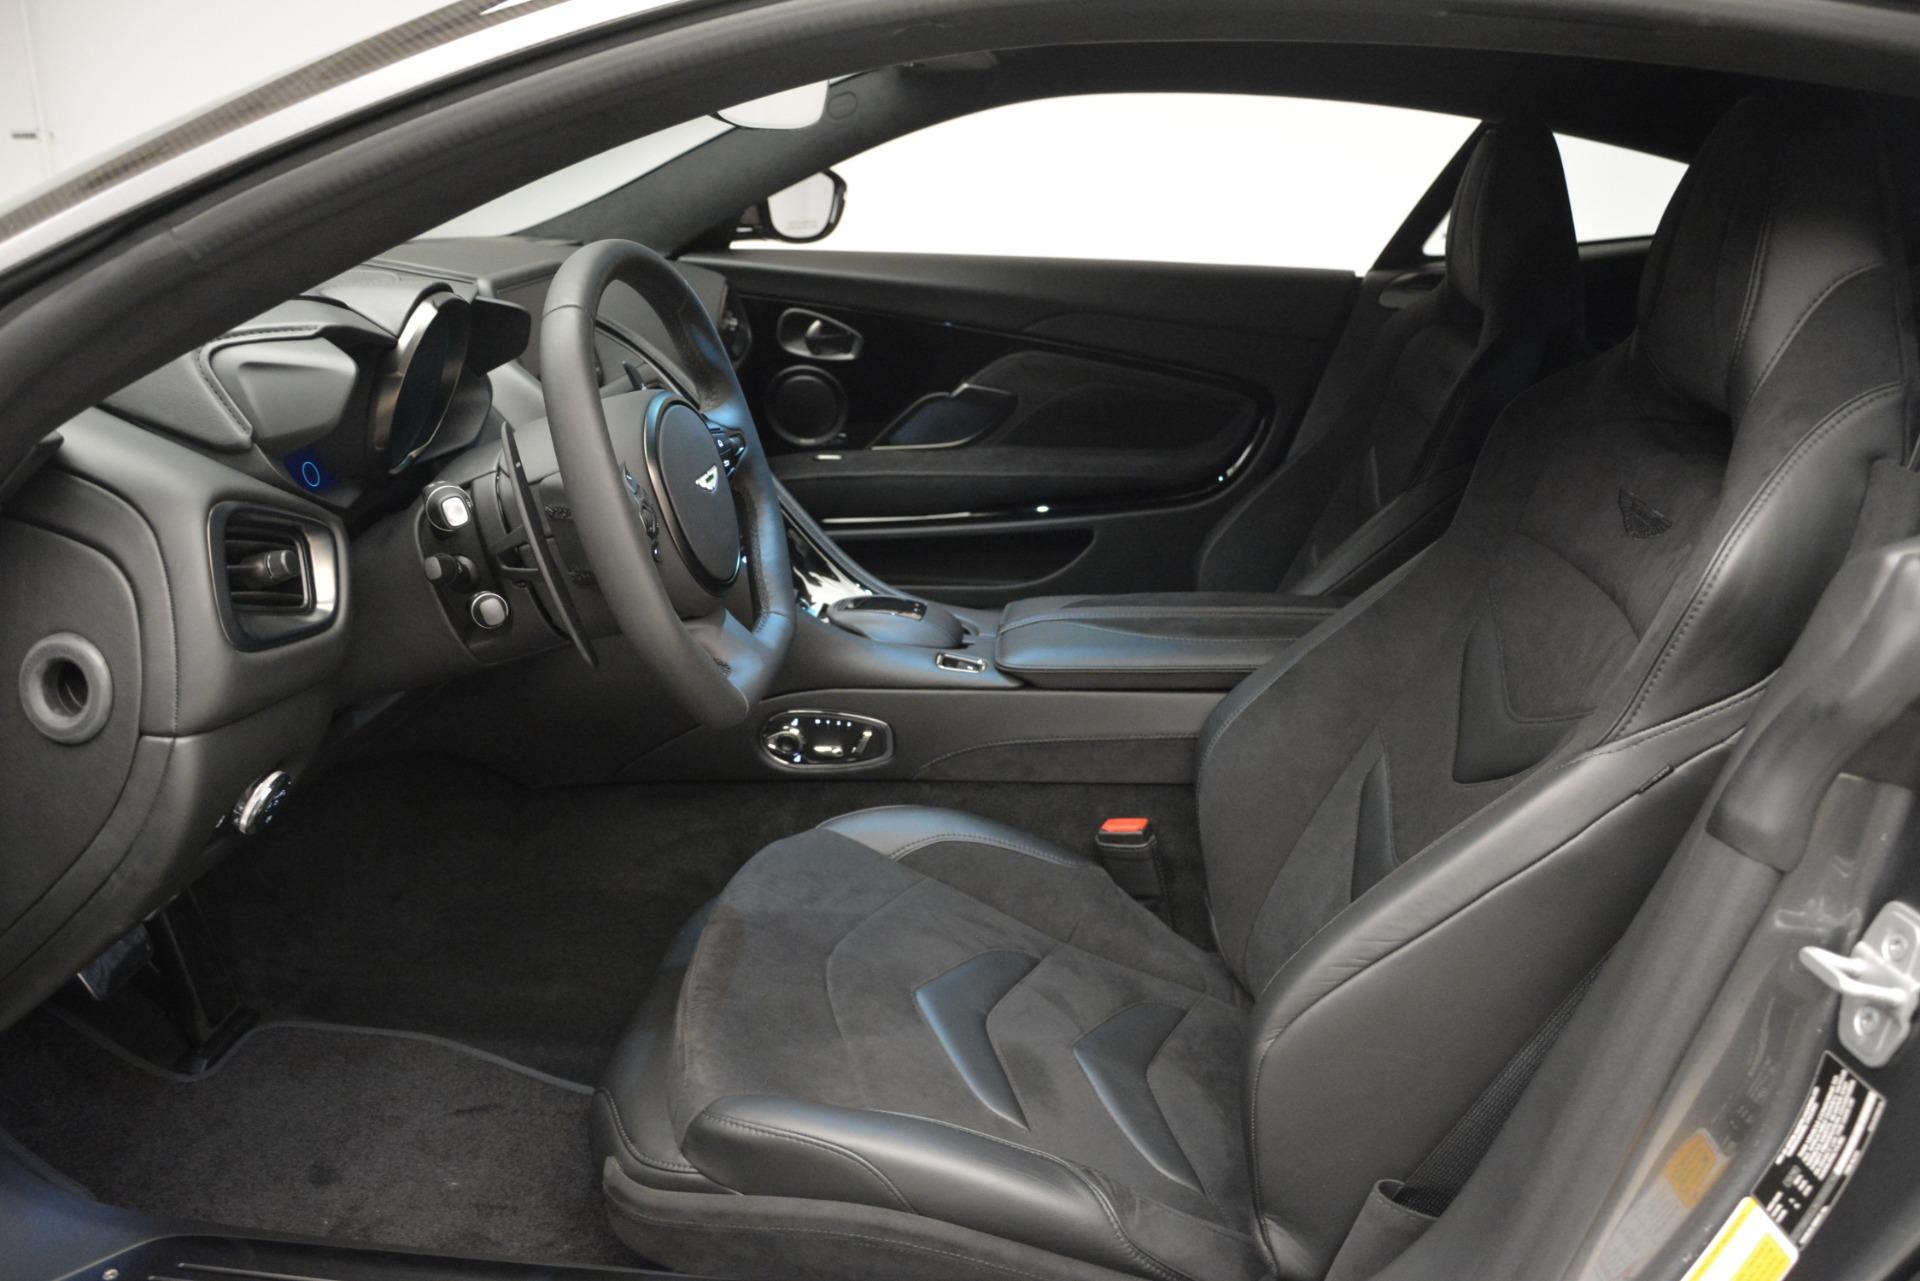 Used 2019 Aston Martin DBS Superleggera For Sale In Greenwich, CT 2917_p15